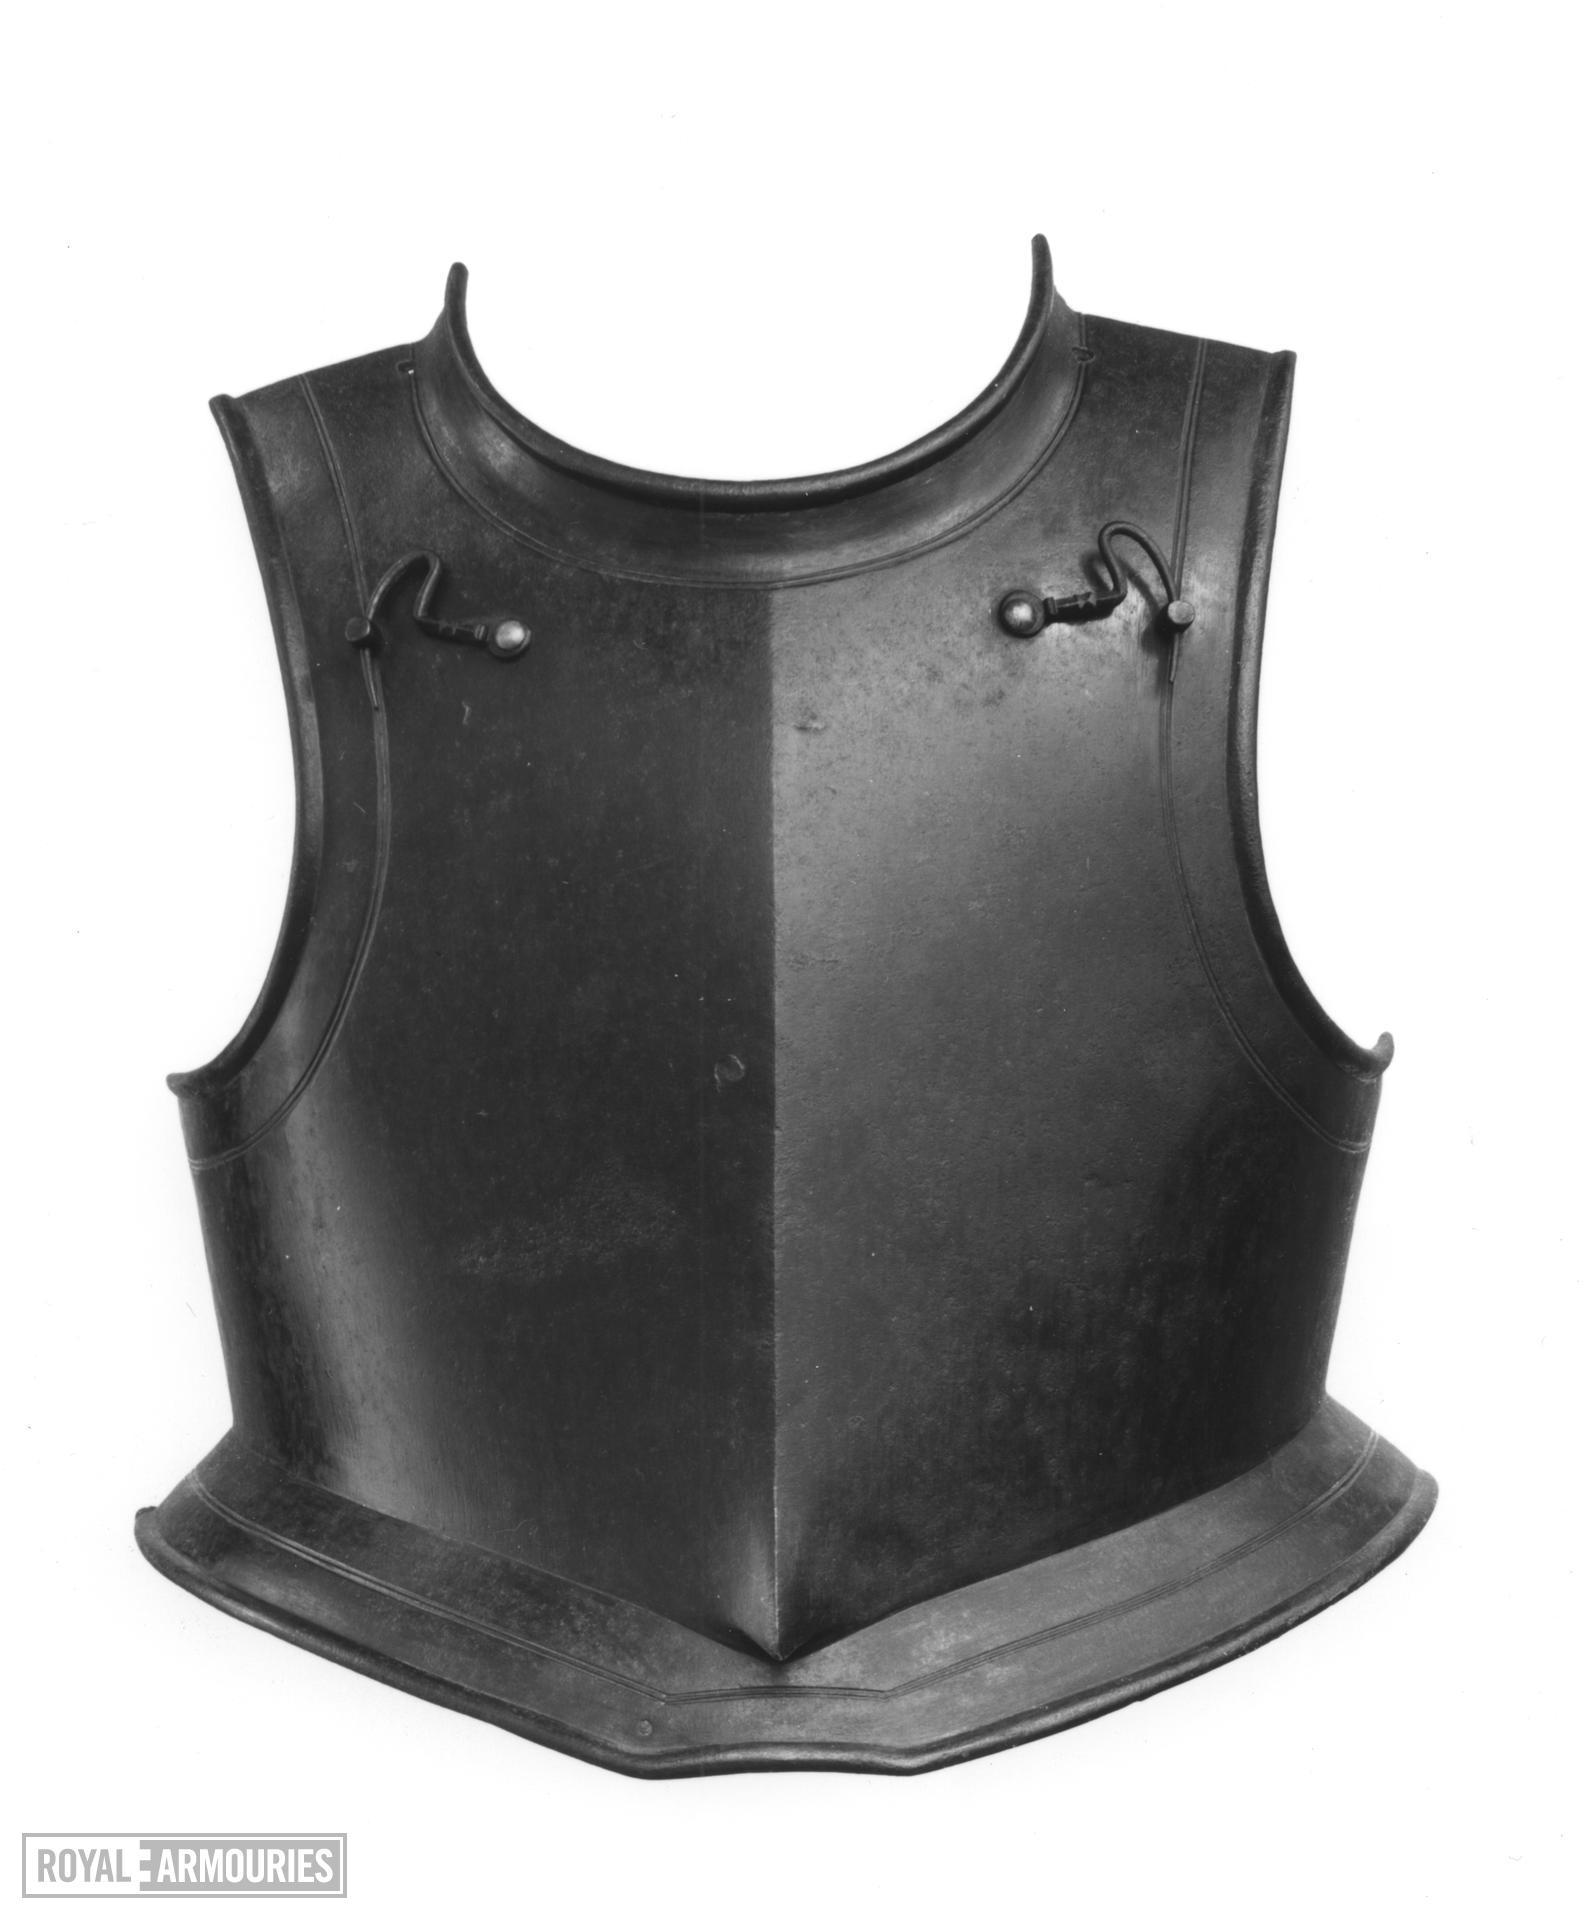 Breastplate Harquebusier's breastplate